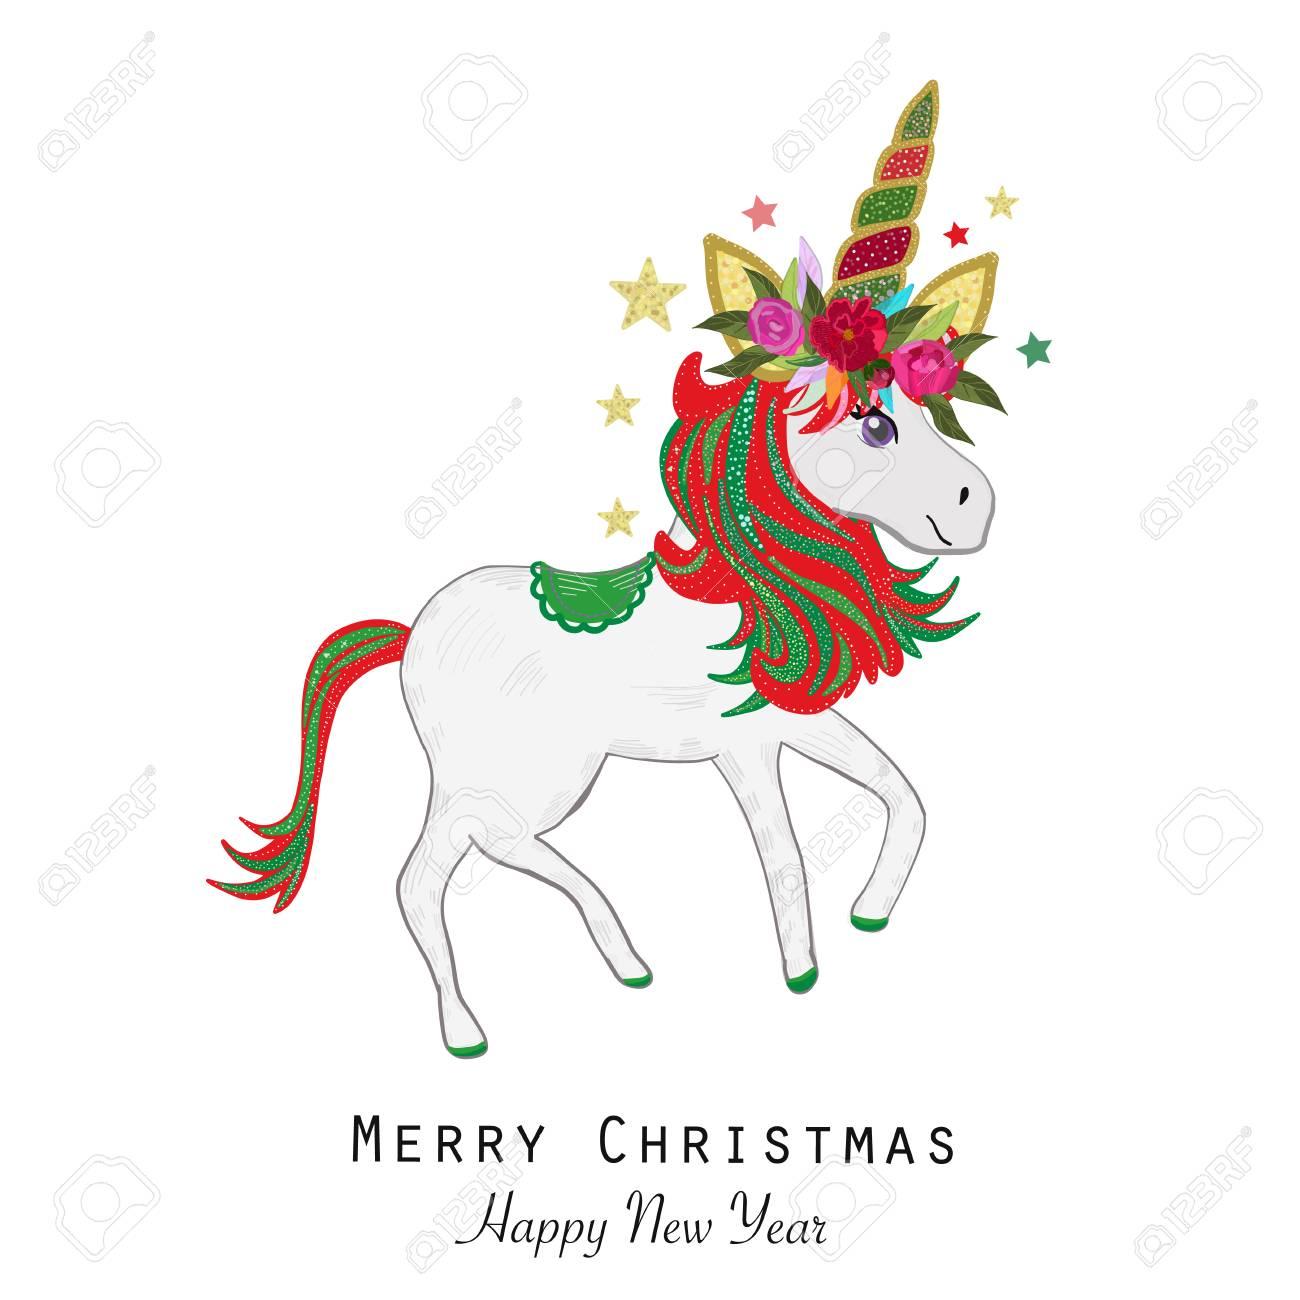 Christmas Unicorn.Magical Unicorn Greeting Card Merry Christmas And Happy New